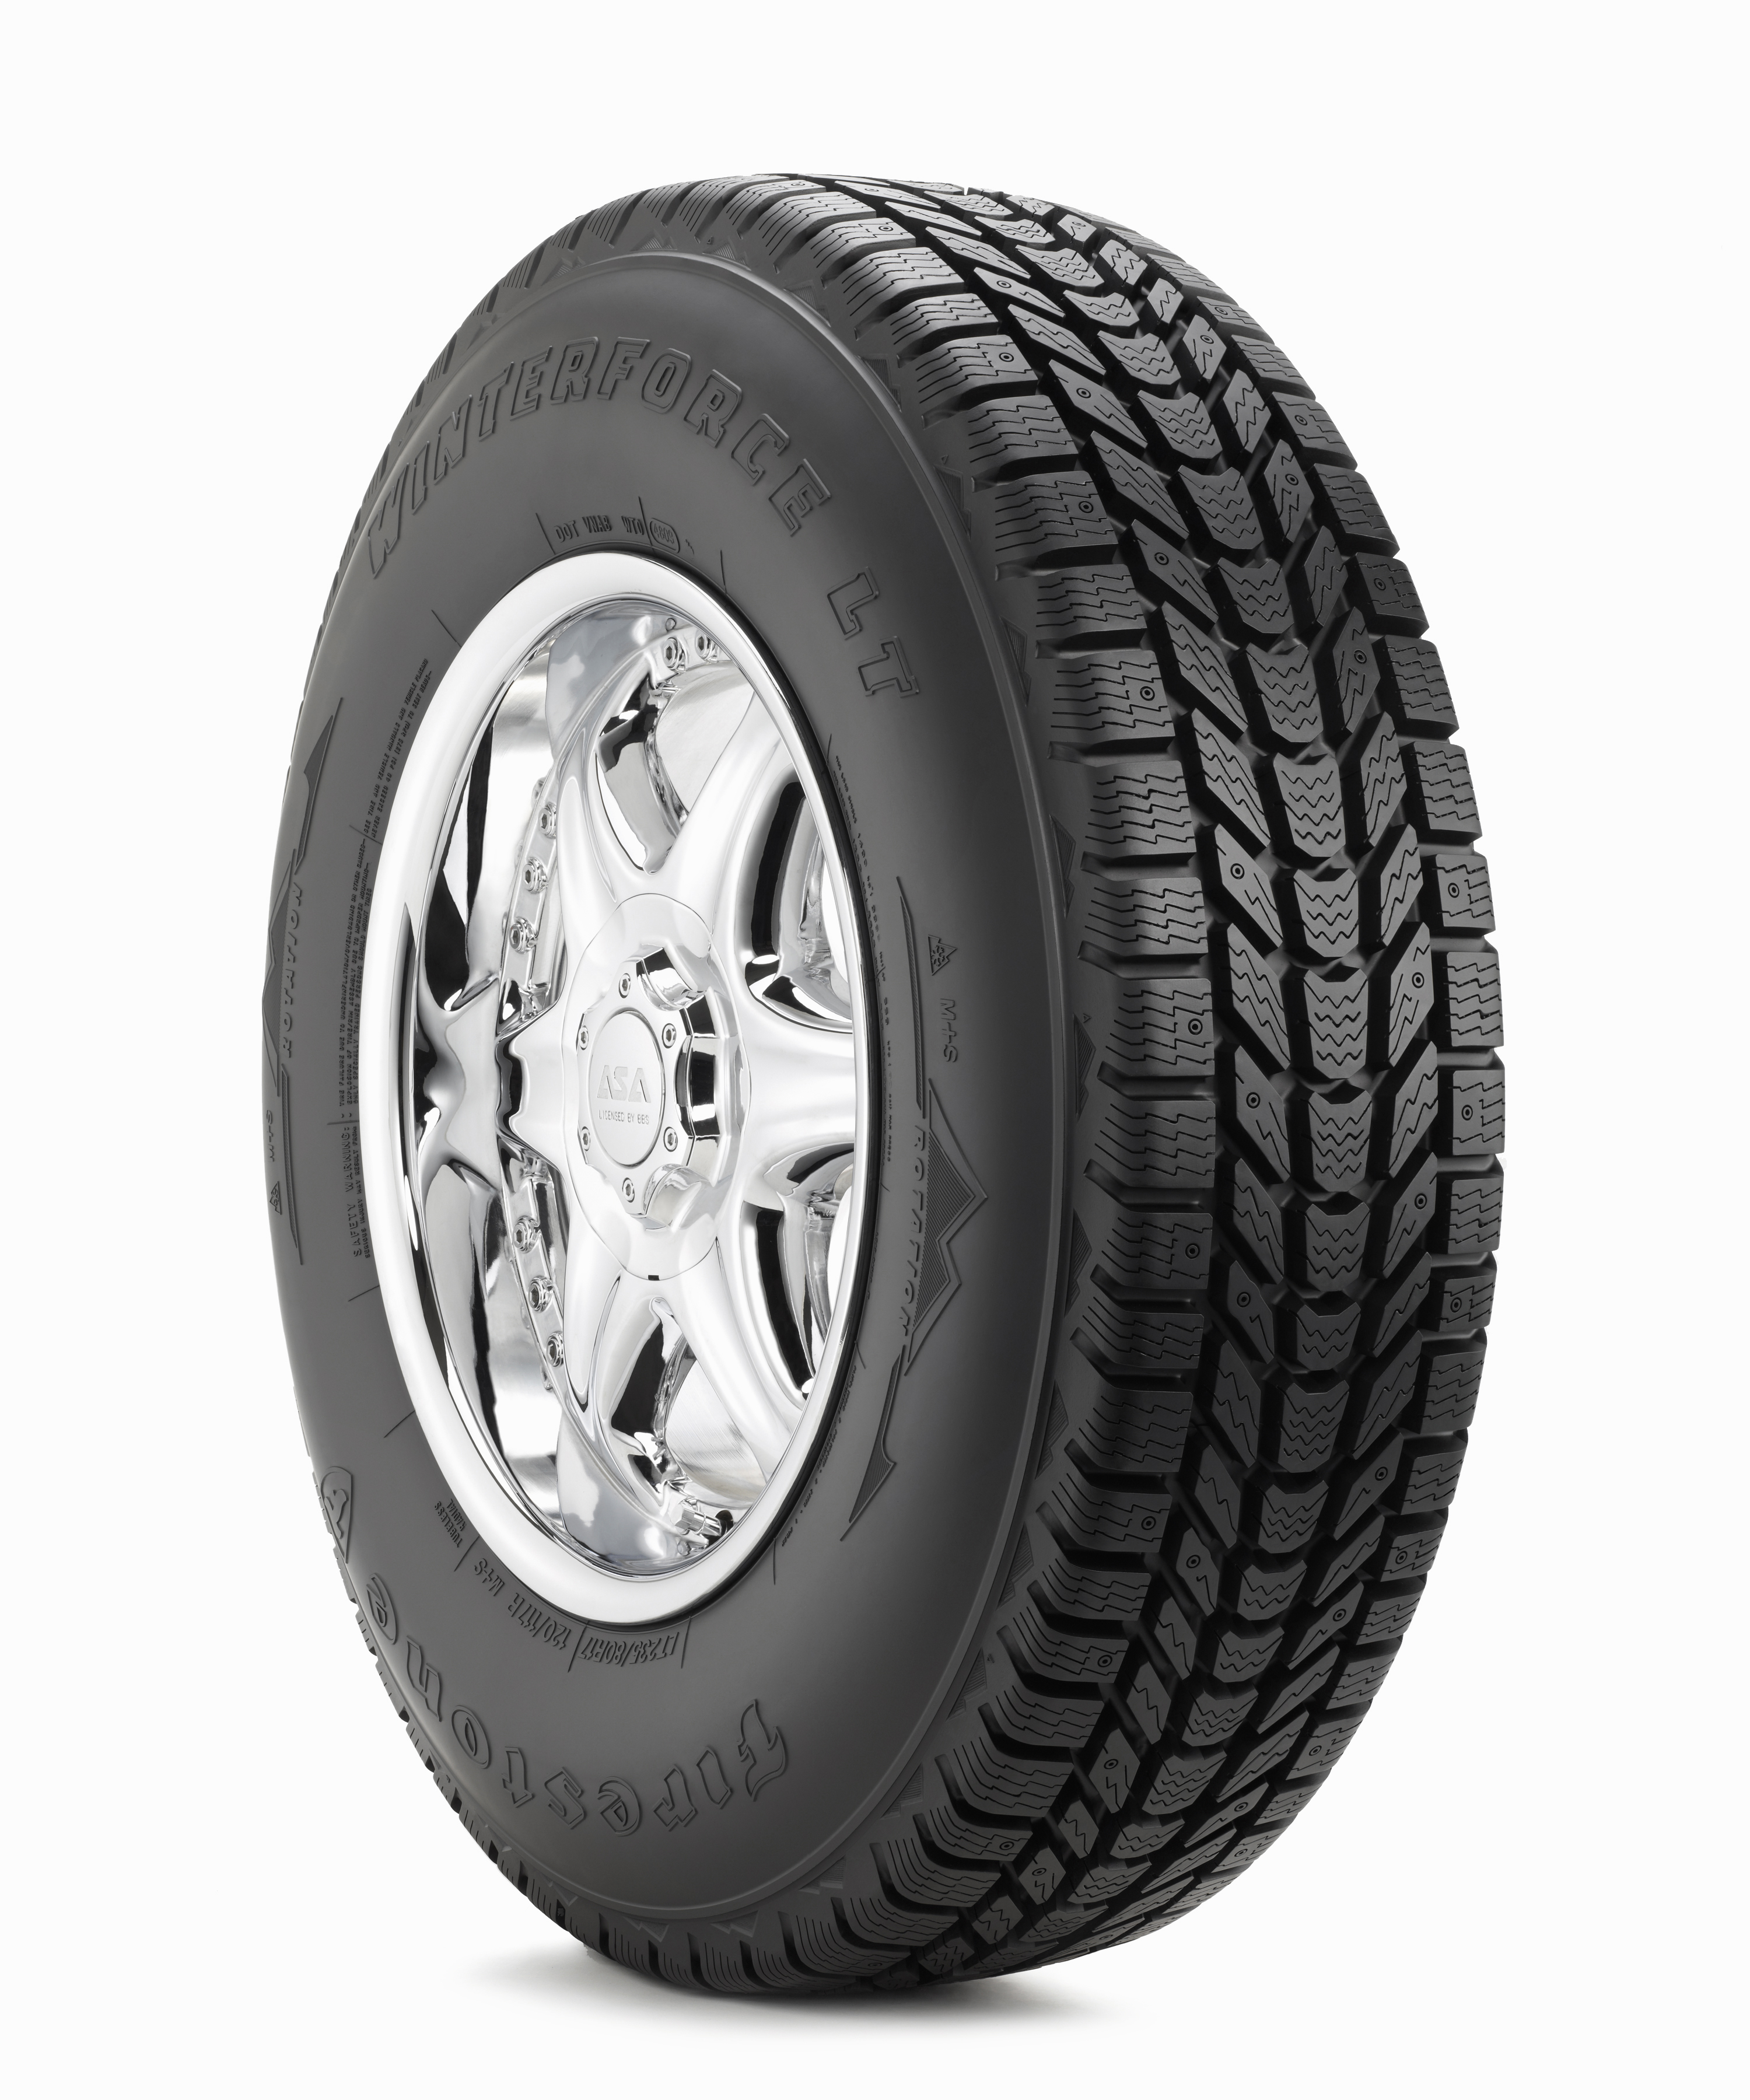 Firestone Winterforce Tires >> LT245/75R16 Firestone Winterforce LT Snow Tire (LRE)